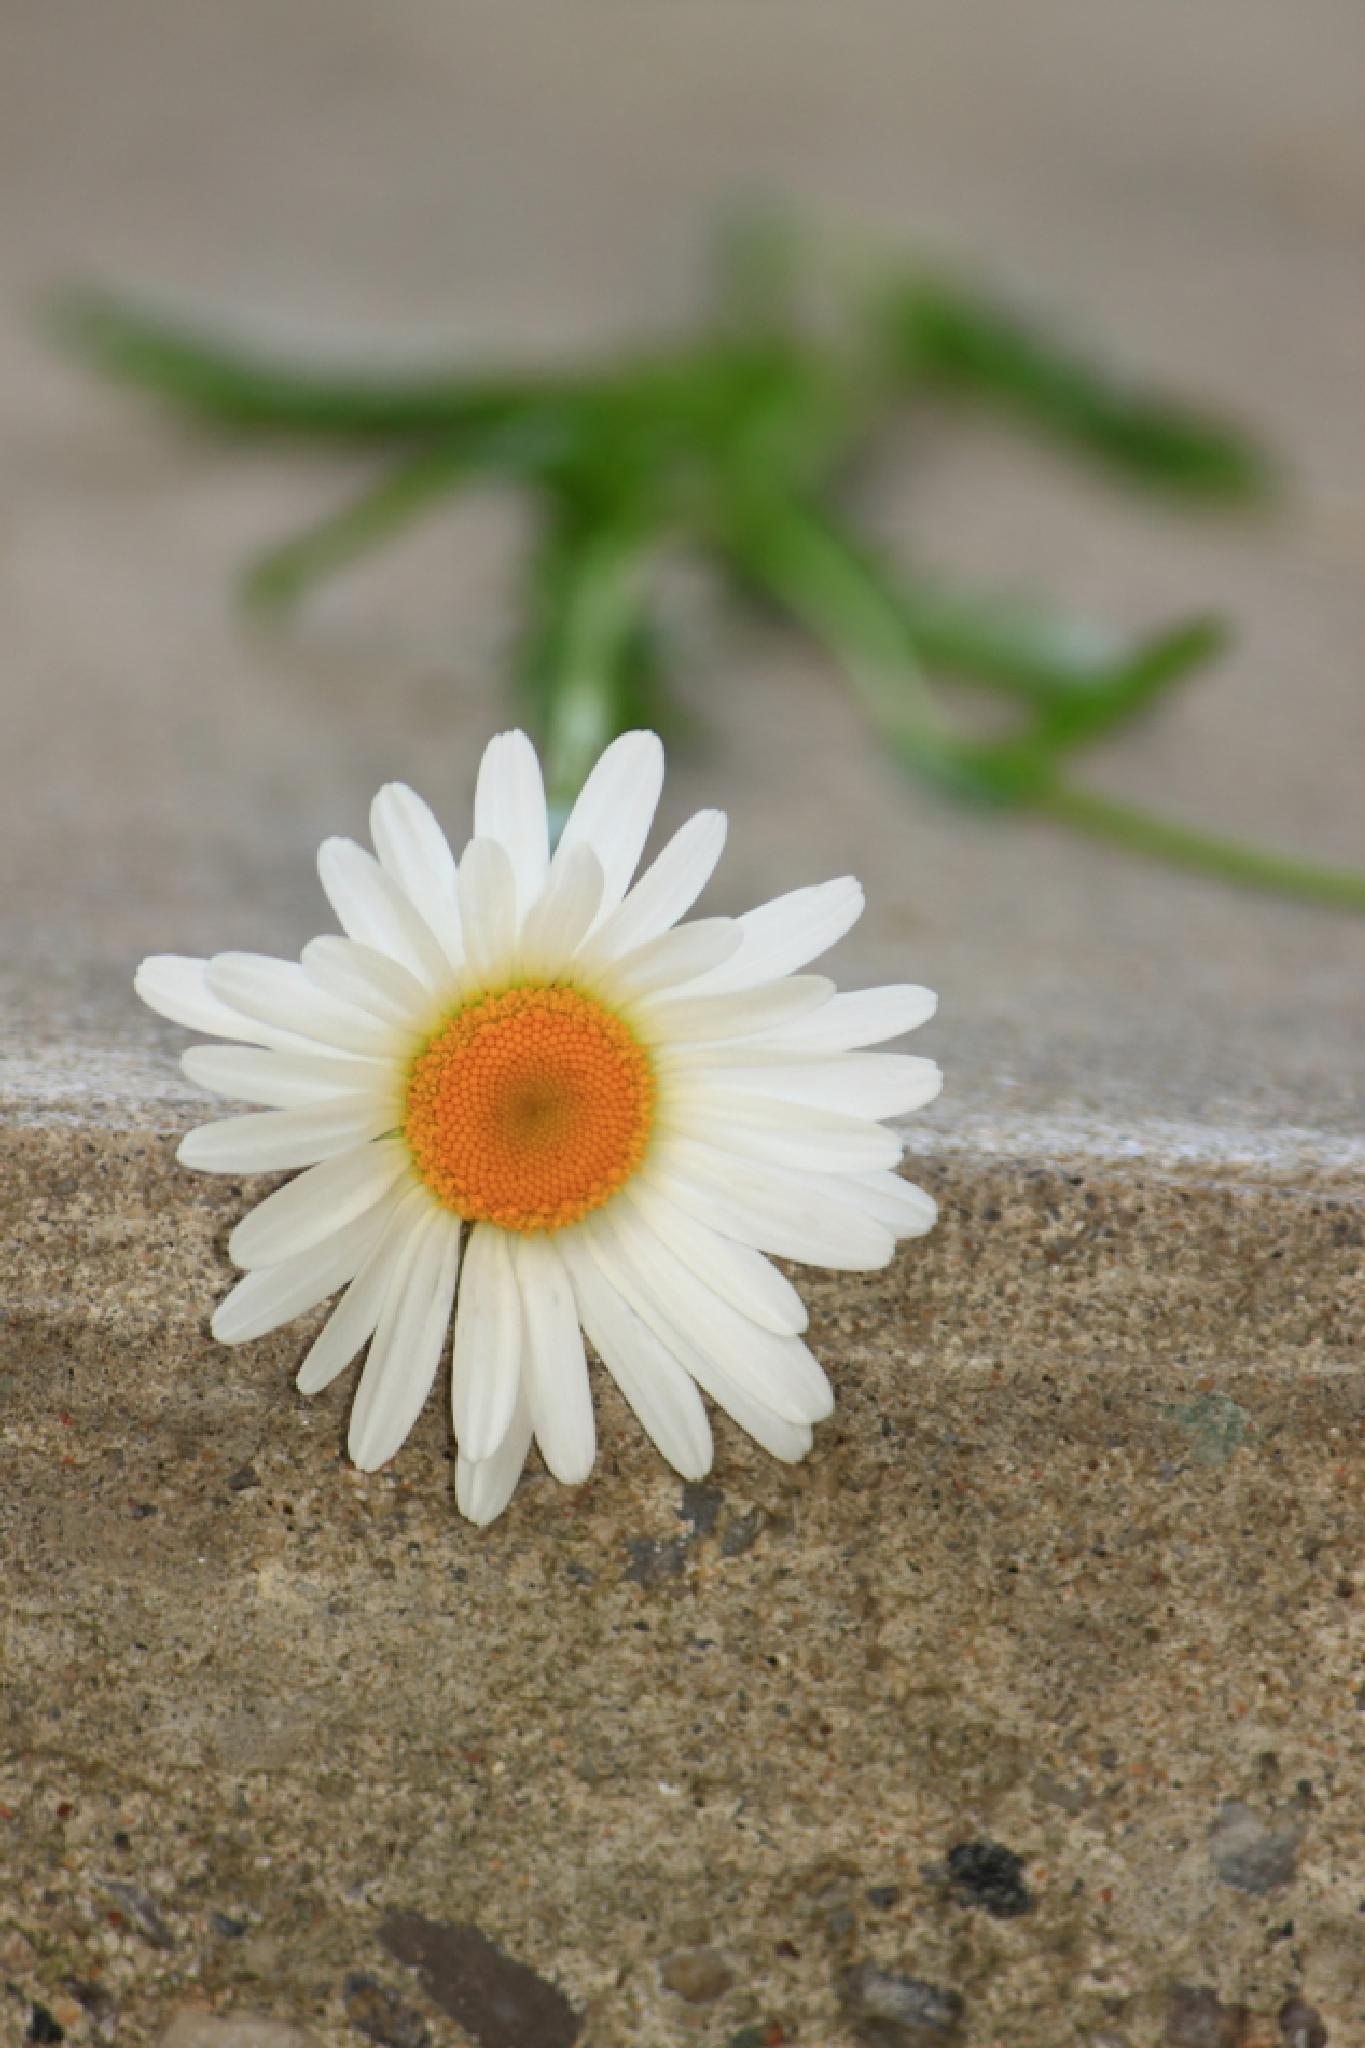 Daisy on a Step by JaniceArnottPhotography